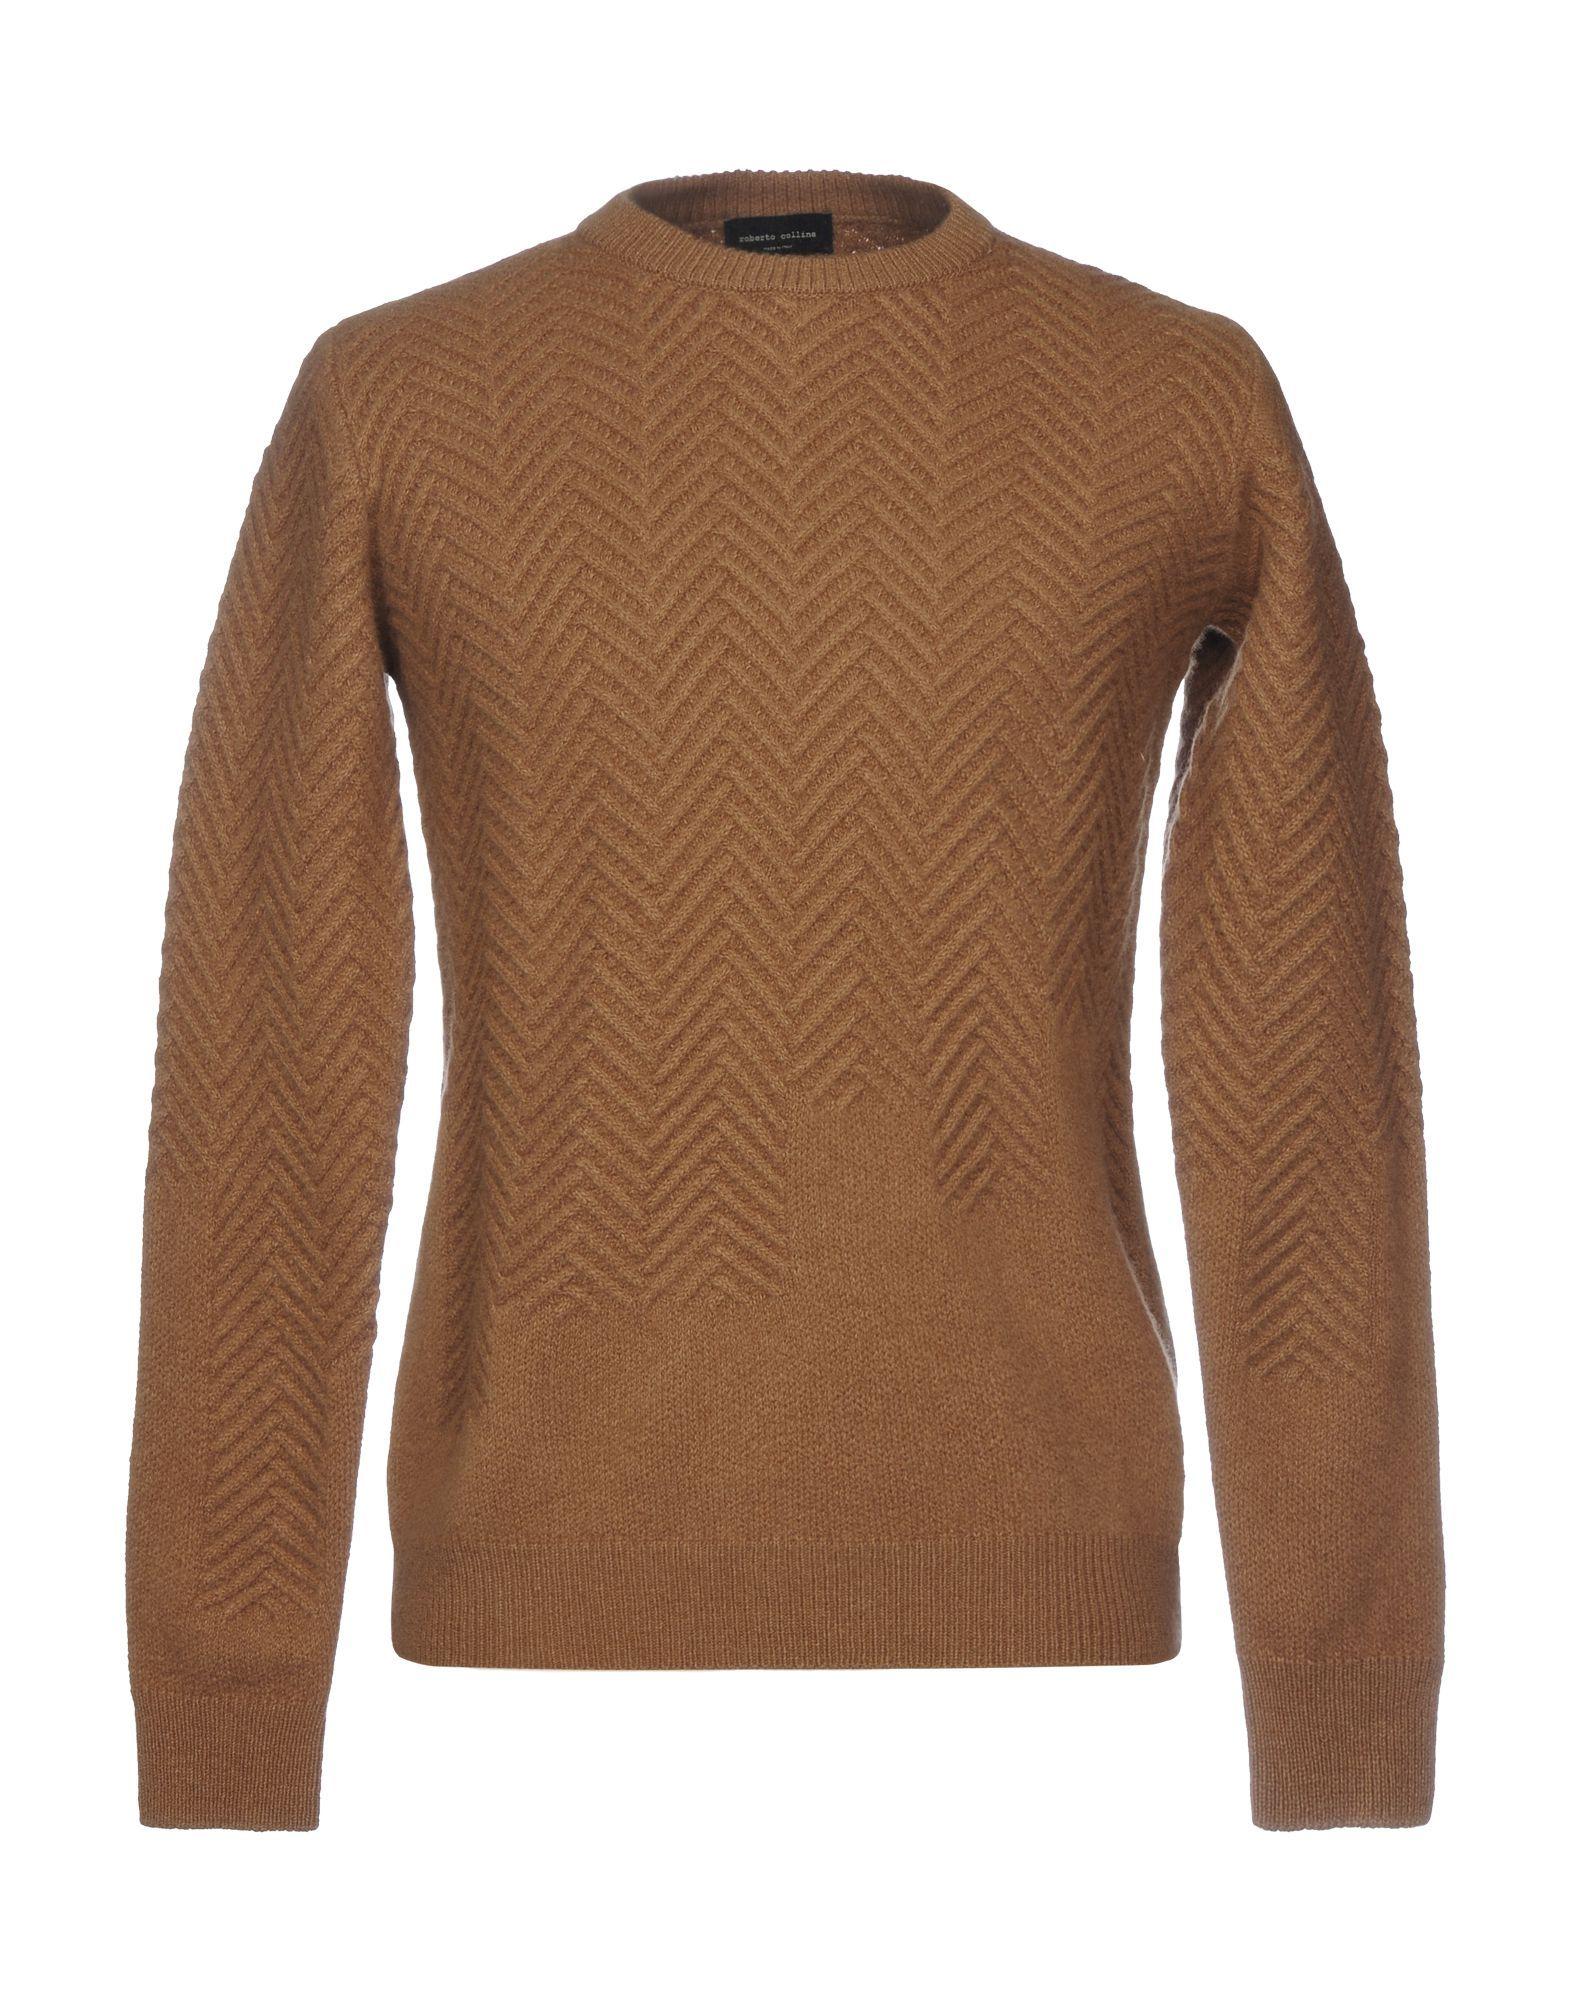 KNITWEAR Roberto Collina Brown Man Merinos Wool